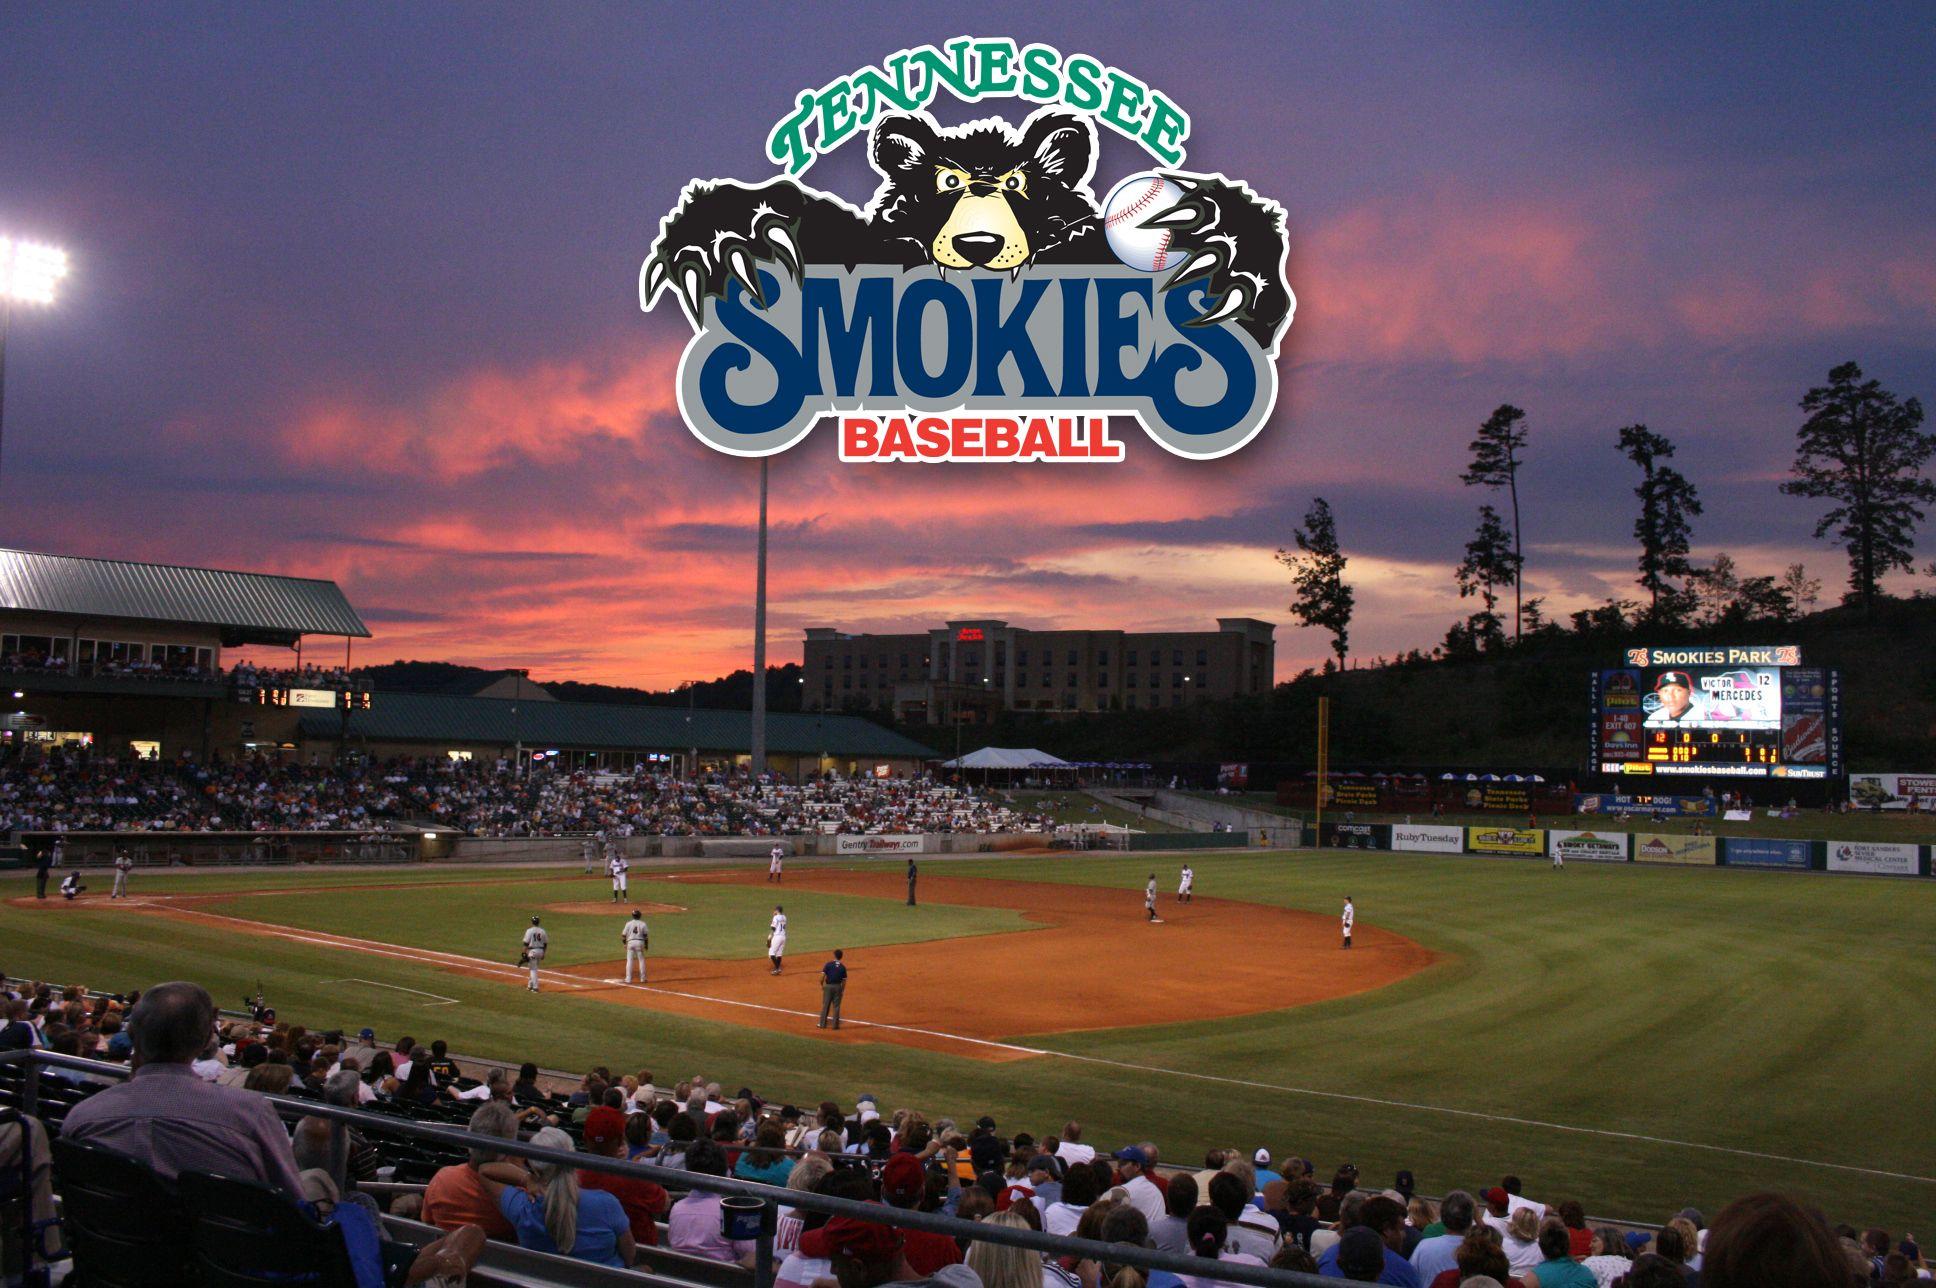 Tennessee Smokies Baseball In Kodak Tennessee Smokies Smokies Baseball